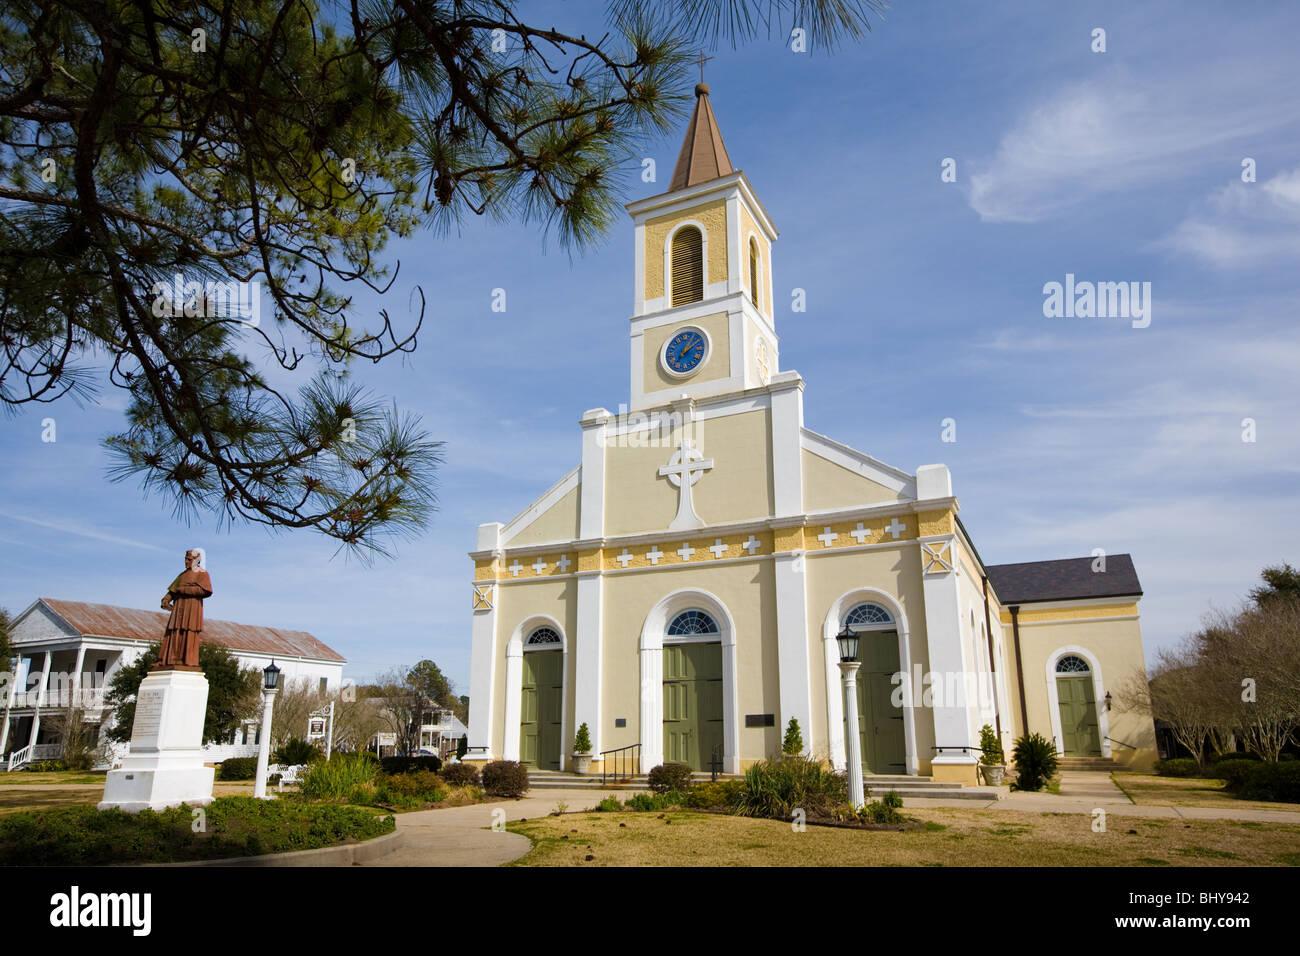 St. Martin de Tours Catholic Church, St. Martinville, Louisiana - Stock Image